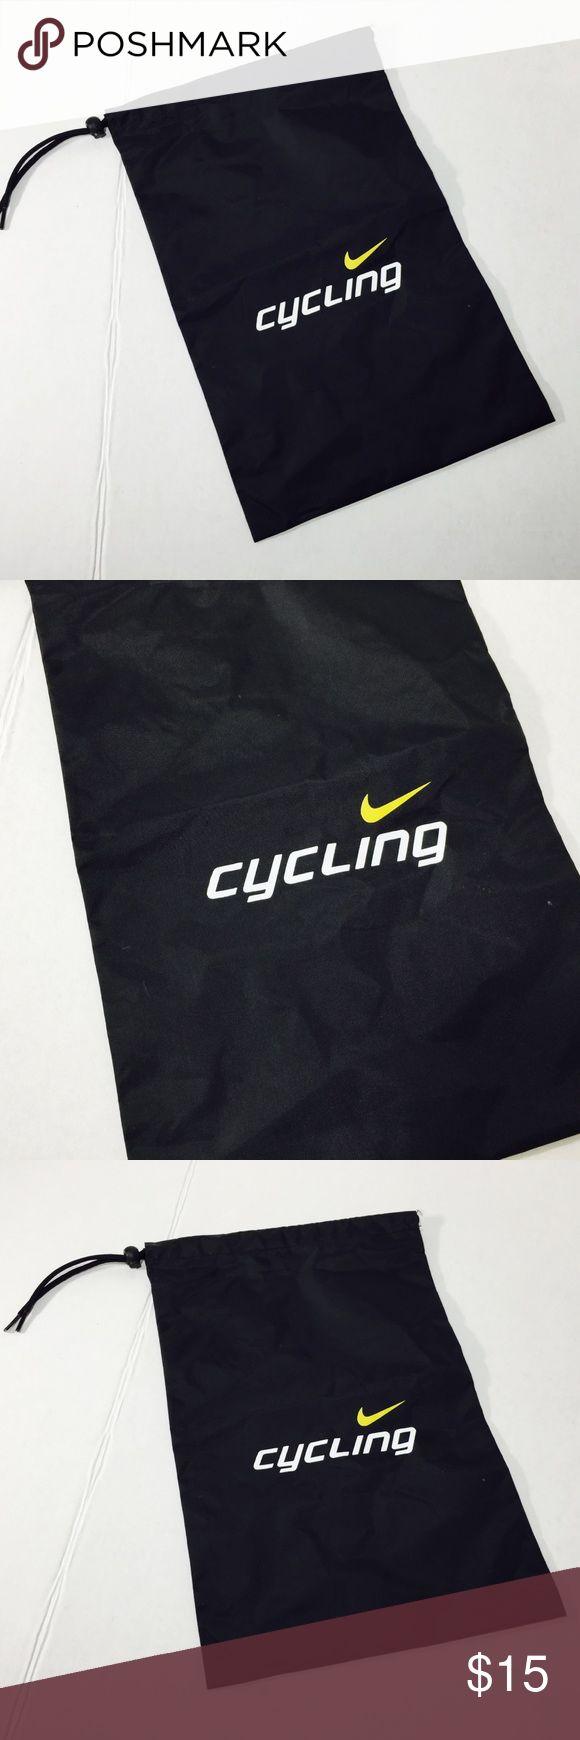 Nike Cycling Nylon draw string bag Black Small Nike Cycling Nylon draw string bag Black white lettering yellow swosh 15x10 gently used - SKU B46 Nike Bags